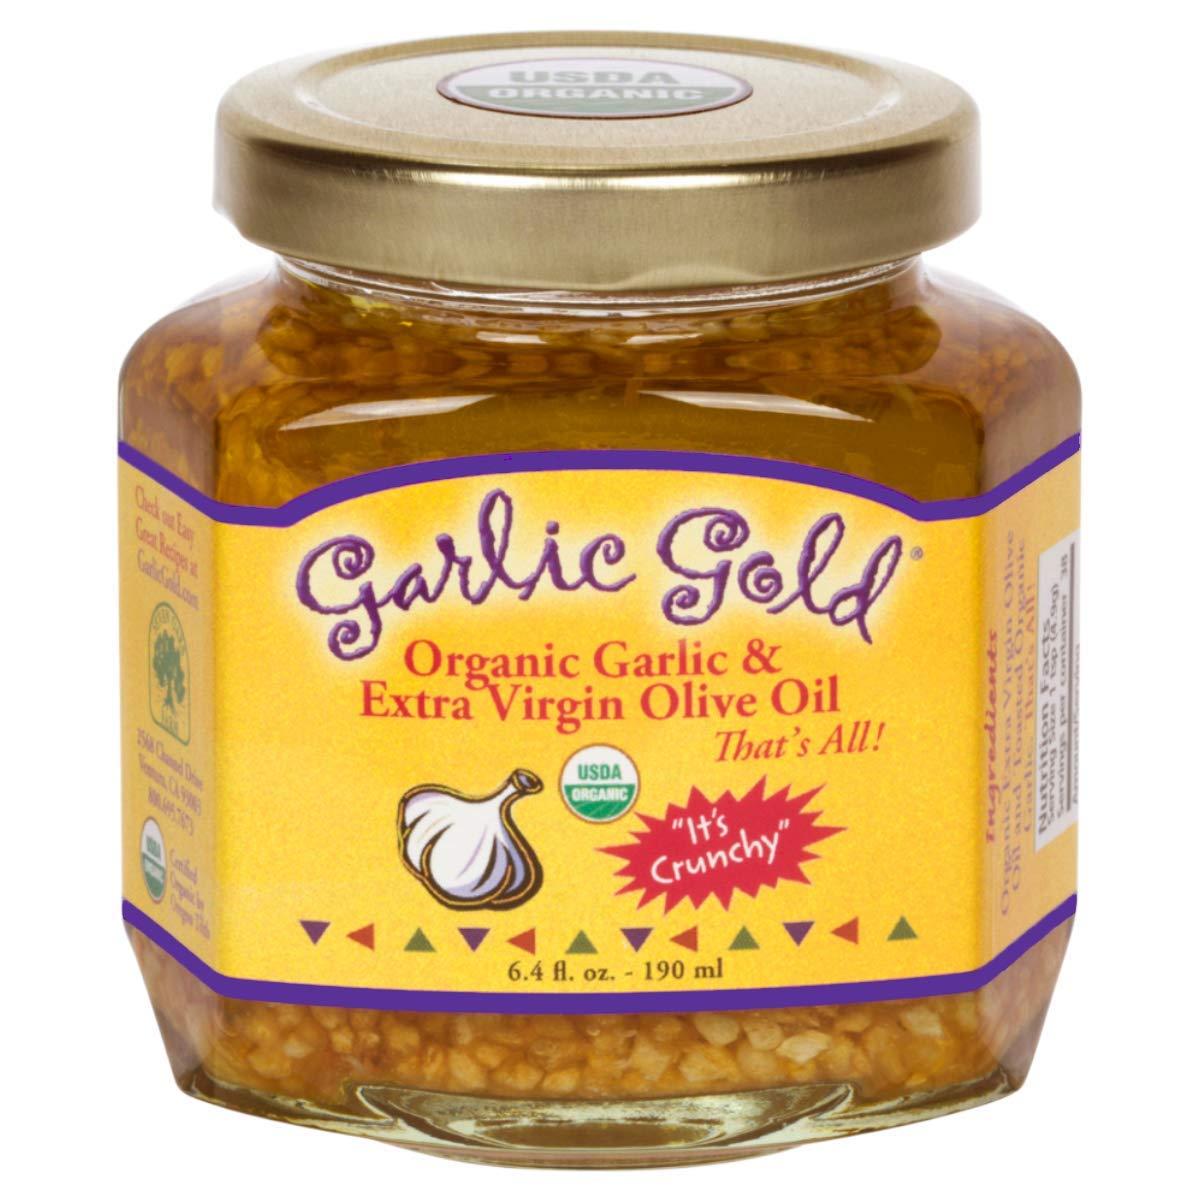 Garlic Gold, USDA Organic Toasted Crunchy Garlic Granules in Extra-Virgin Olive Oil – Soy Free, Sodium Free, Keto, Vegan, Paleo (Glass Jar – 6.4 Ounces)